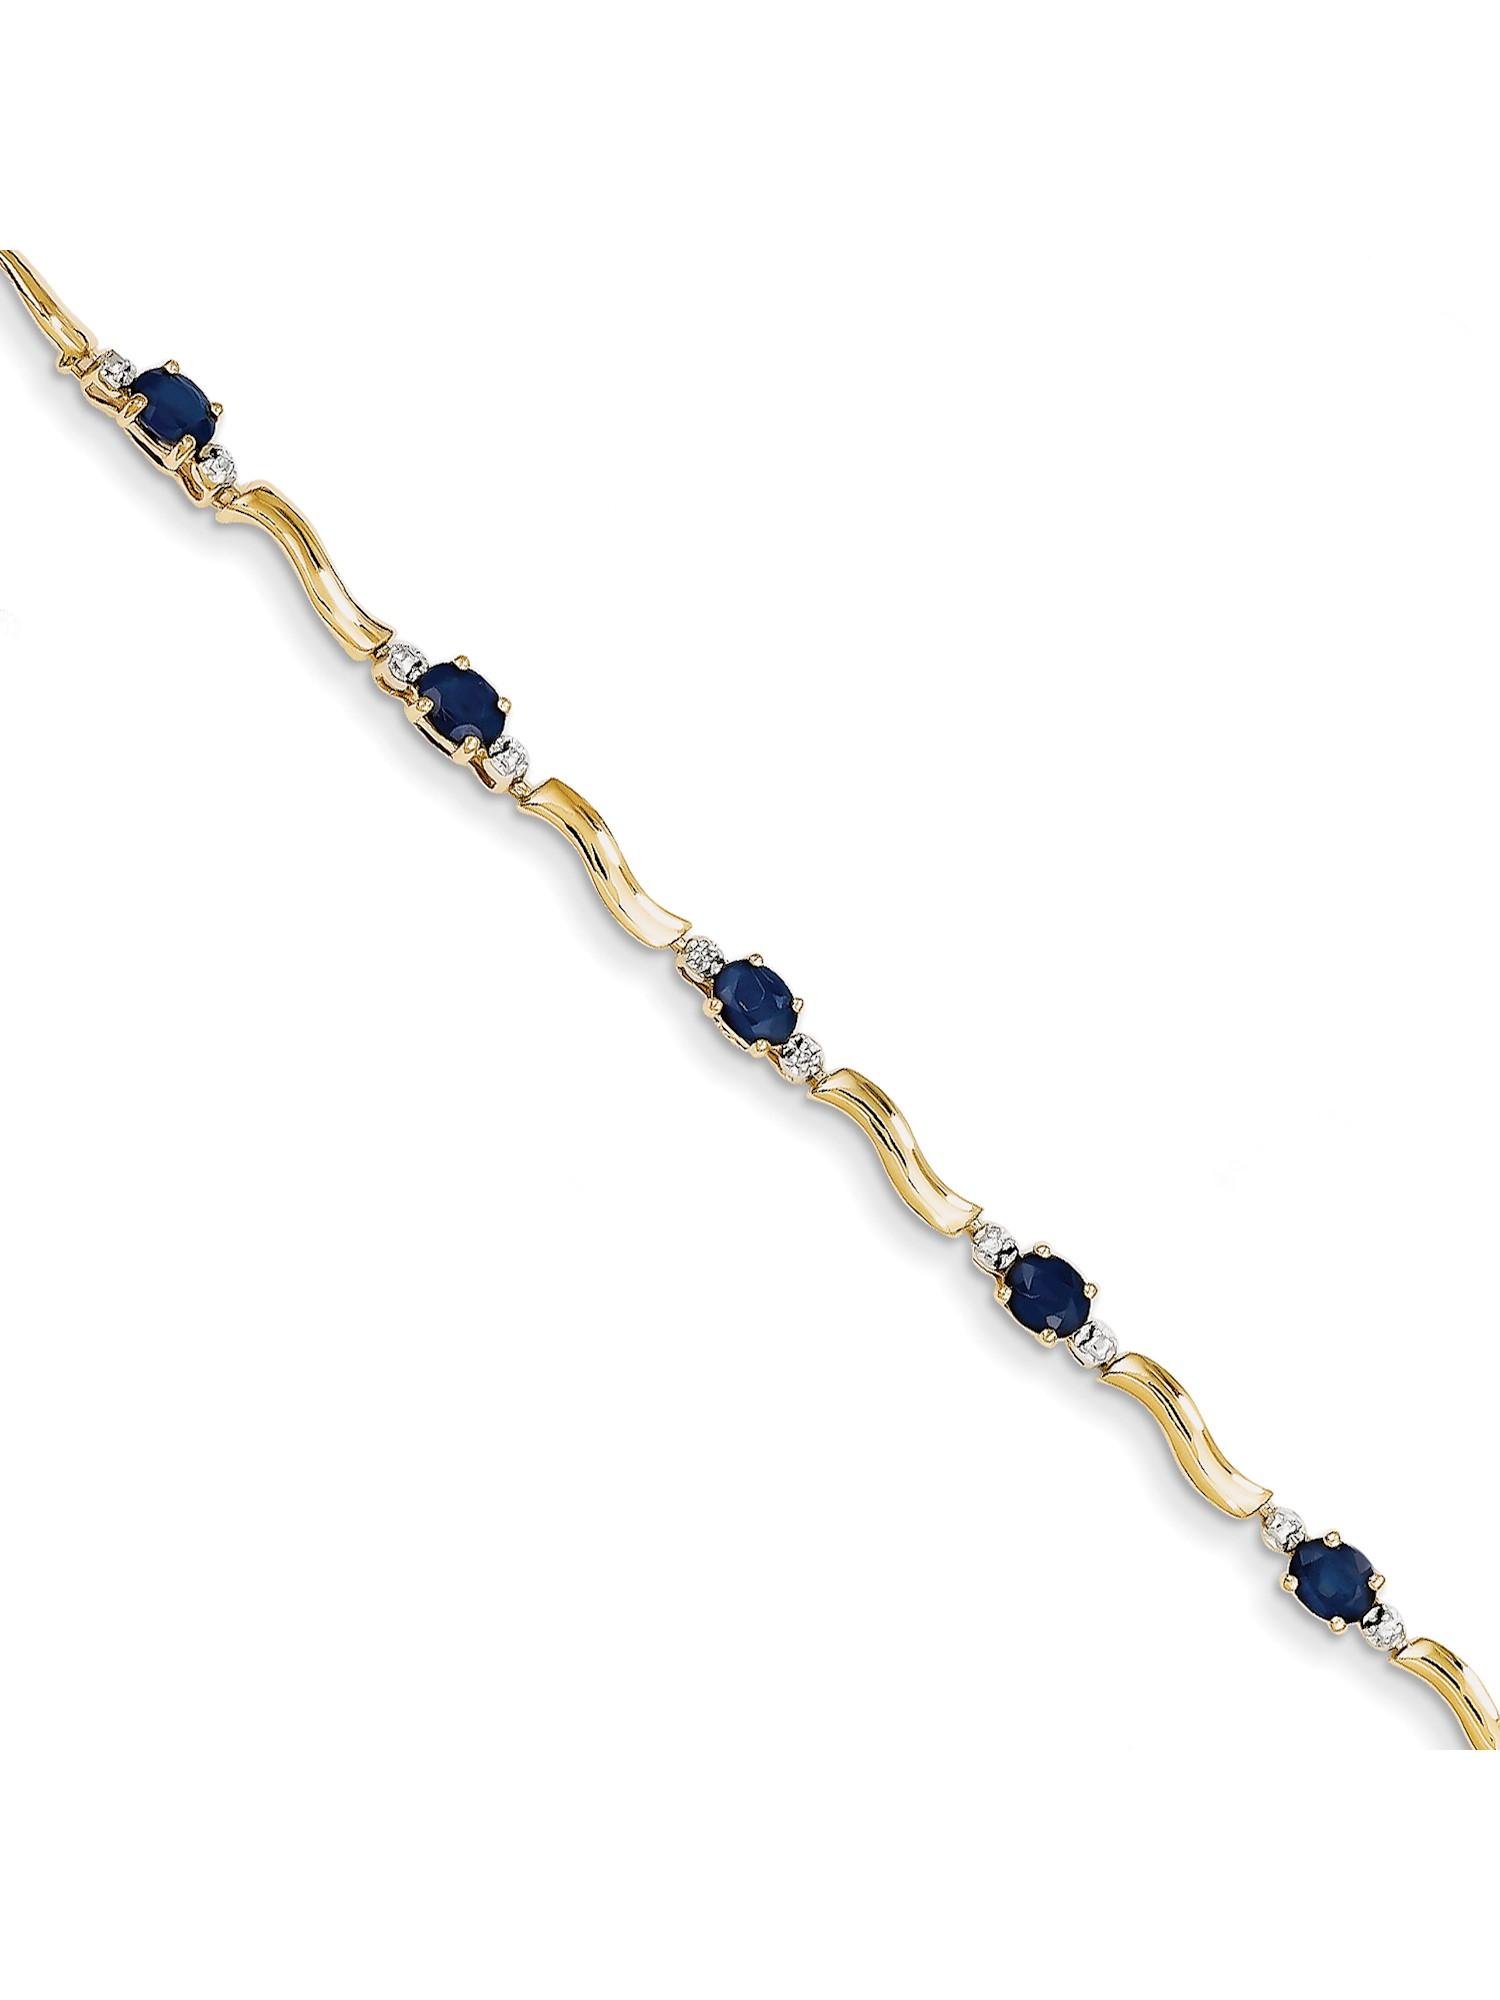 14k Yellow Gold Diamond and Sapphire Bracelet by